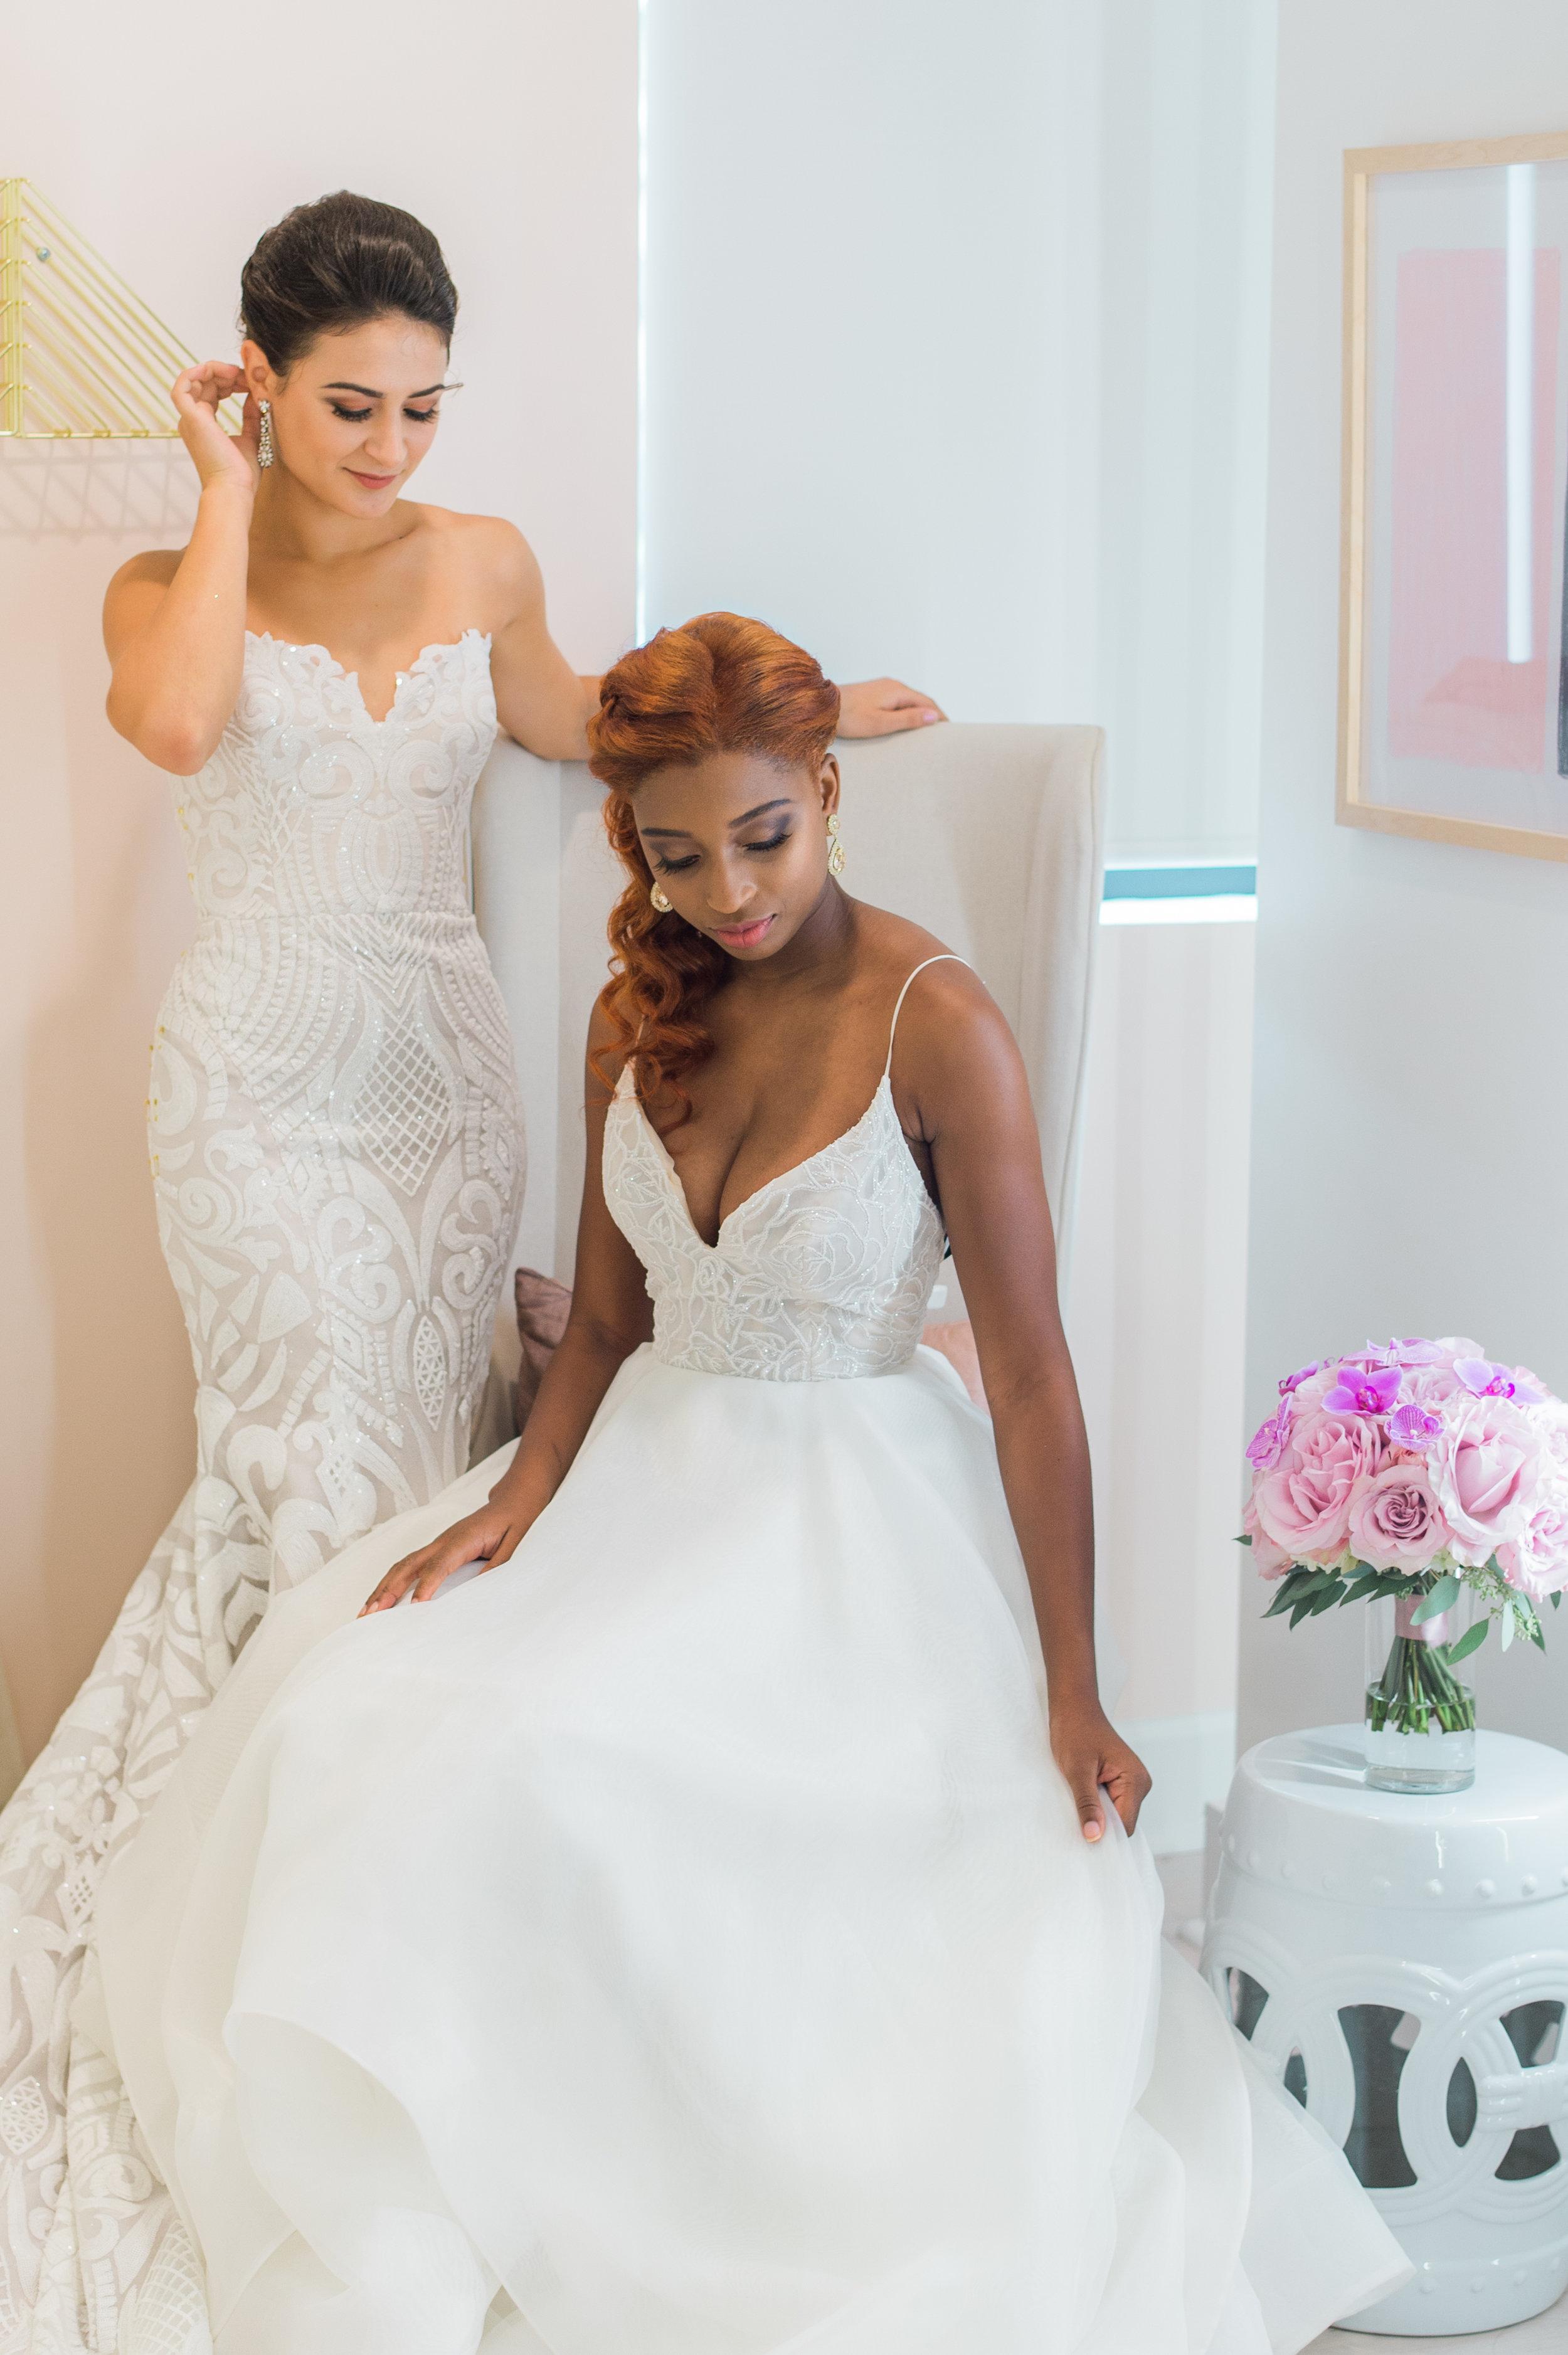 luck love photography - northern virginia wedding photographer - the bridal room va - the dresses-47.jpg